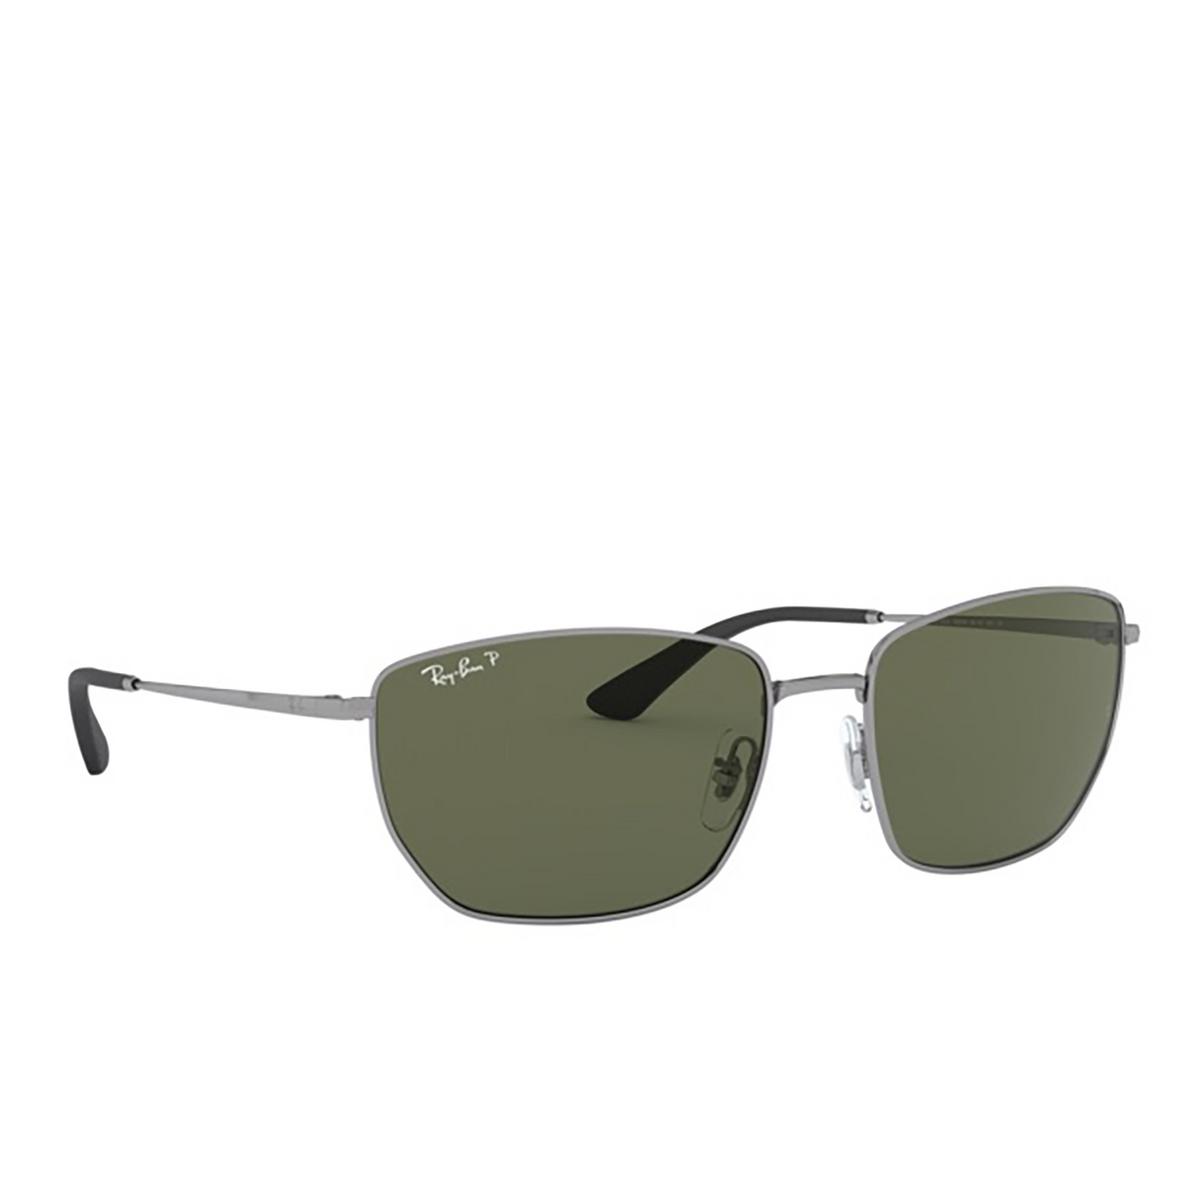 Ray-Ban® Square Sunglasses: RB3653 color Gunmetal 004/9A - 2/3.